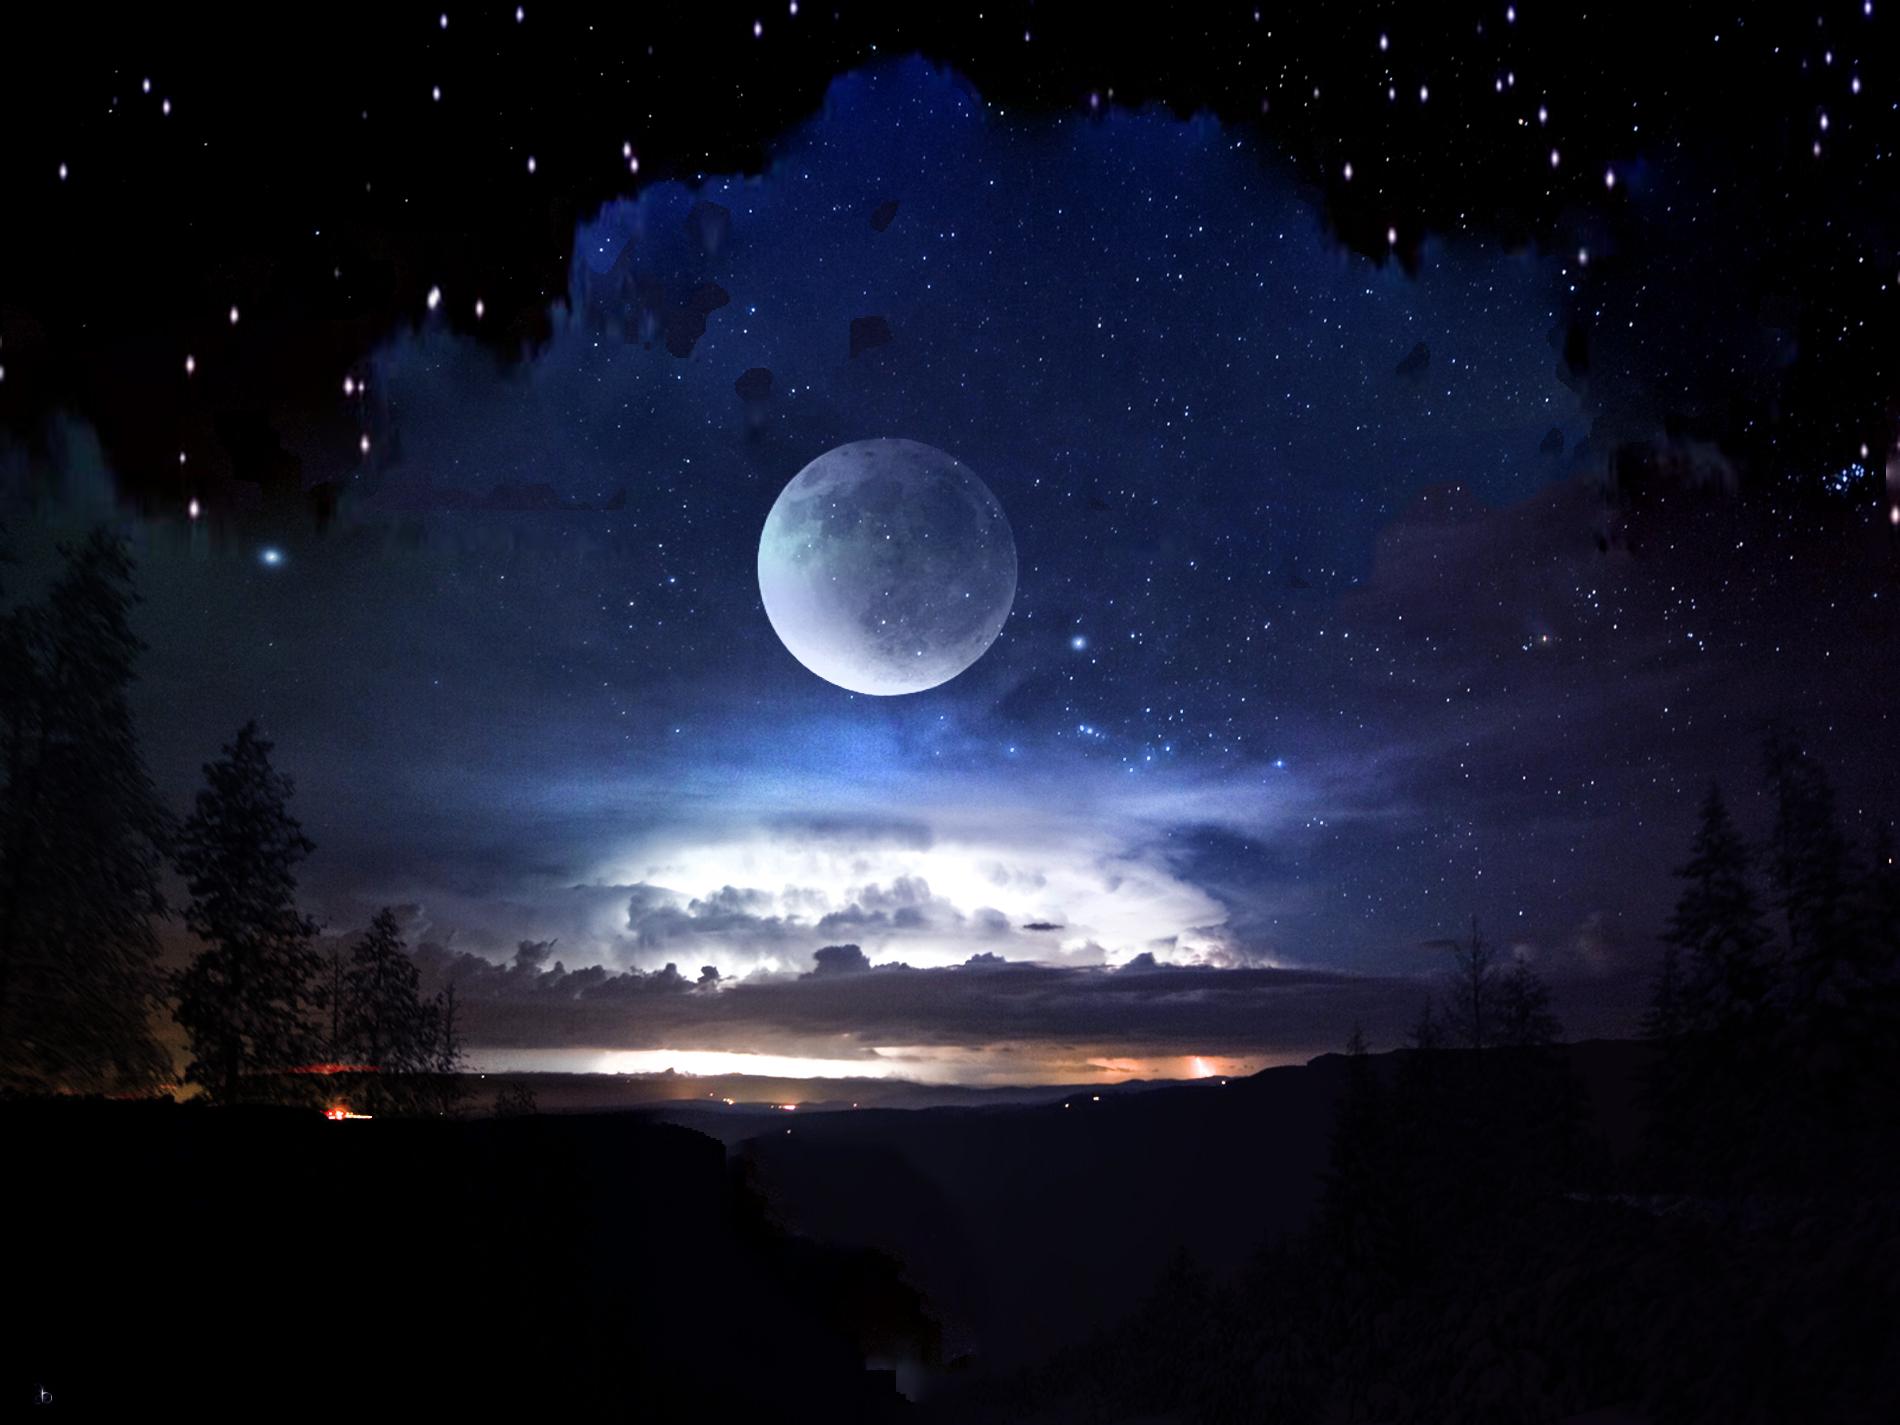 star background sun moon - photo #11